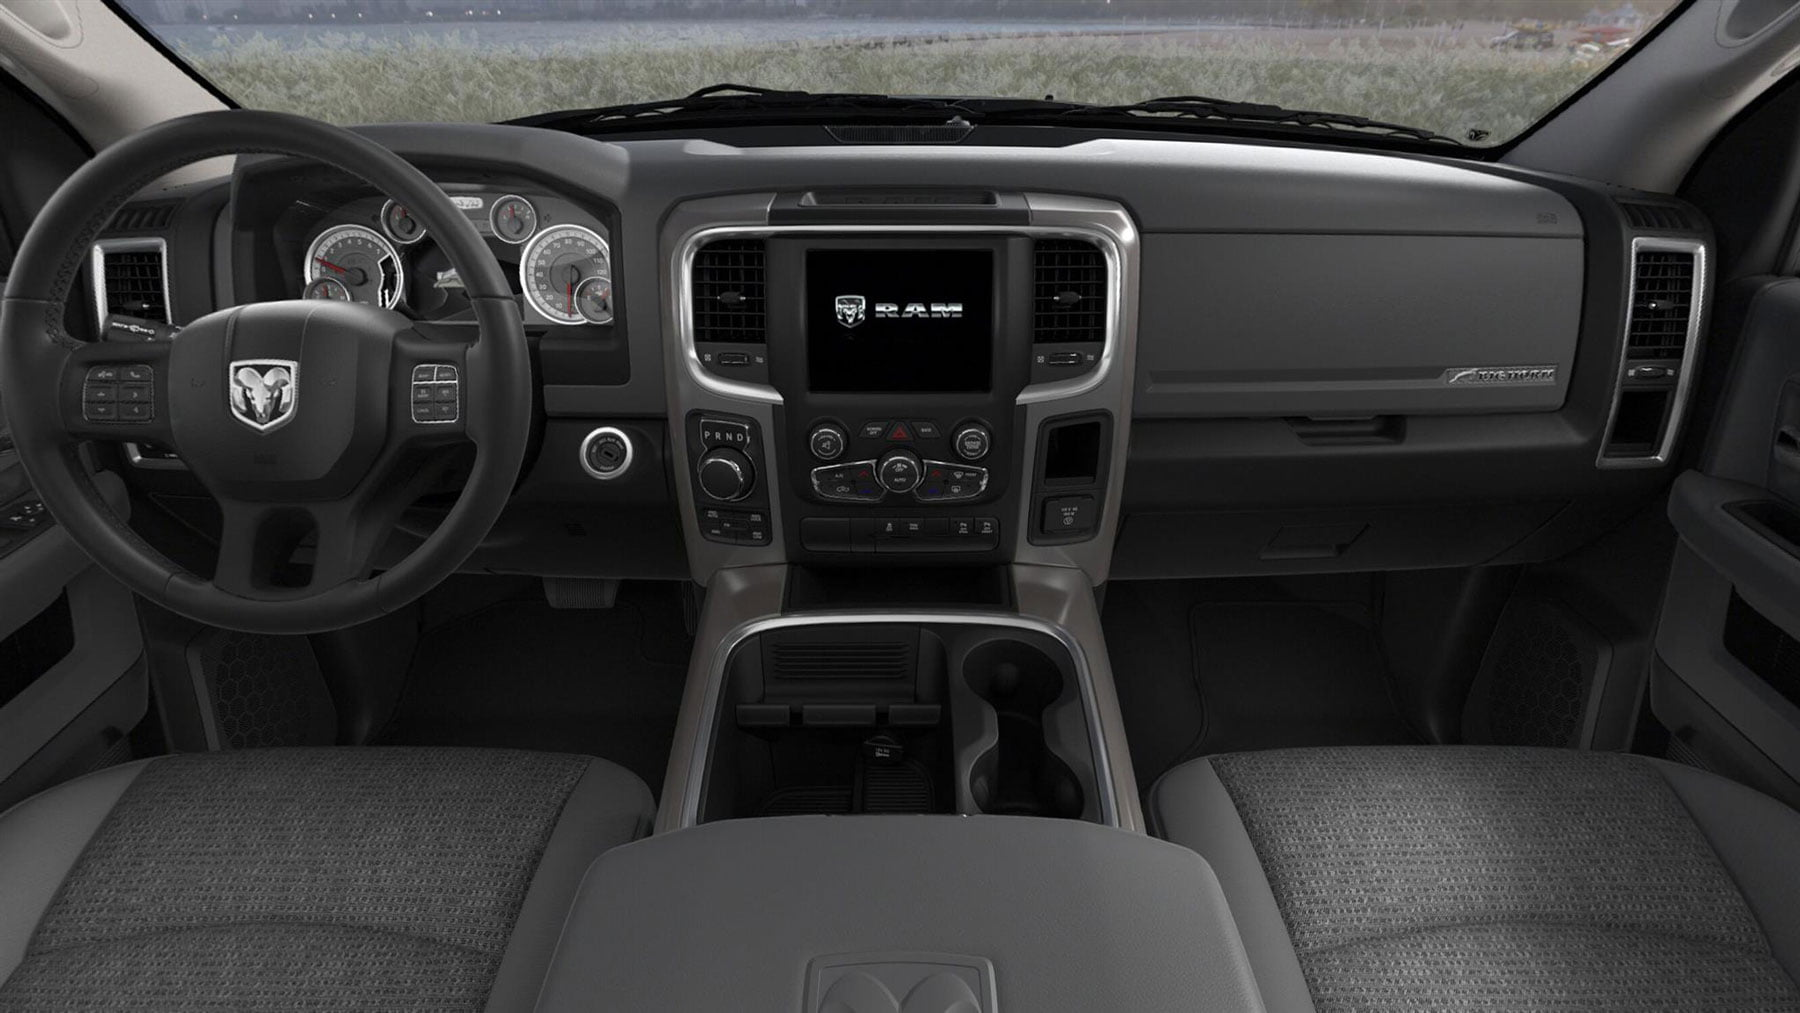 RAM 1500 SLT 2018 interior cloth bucket seats